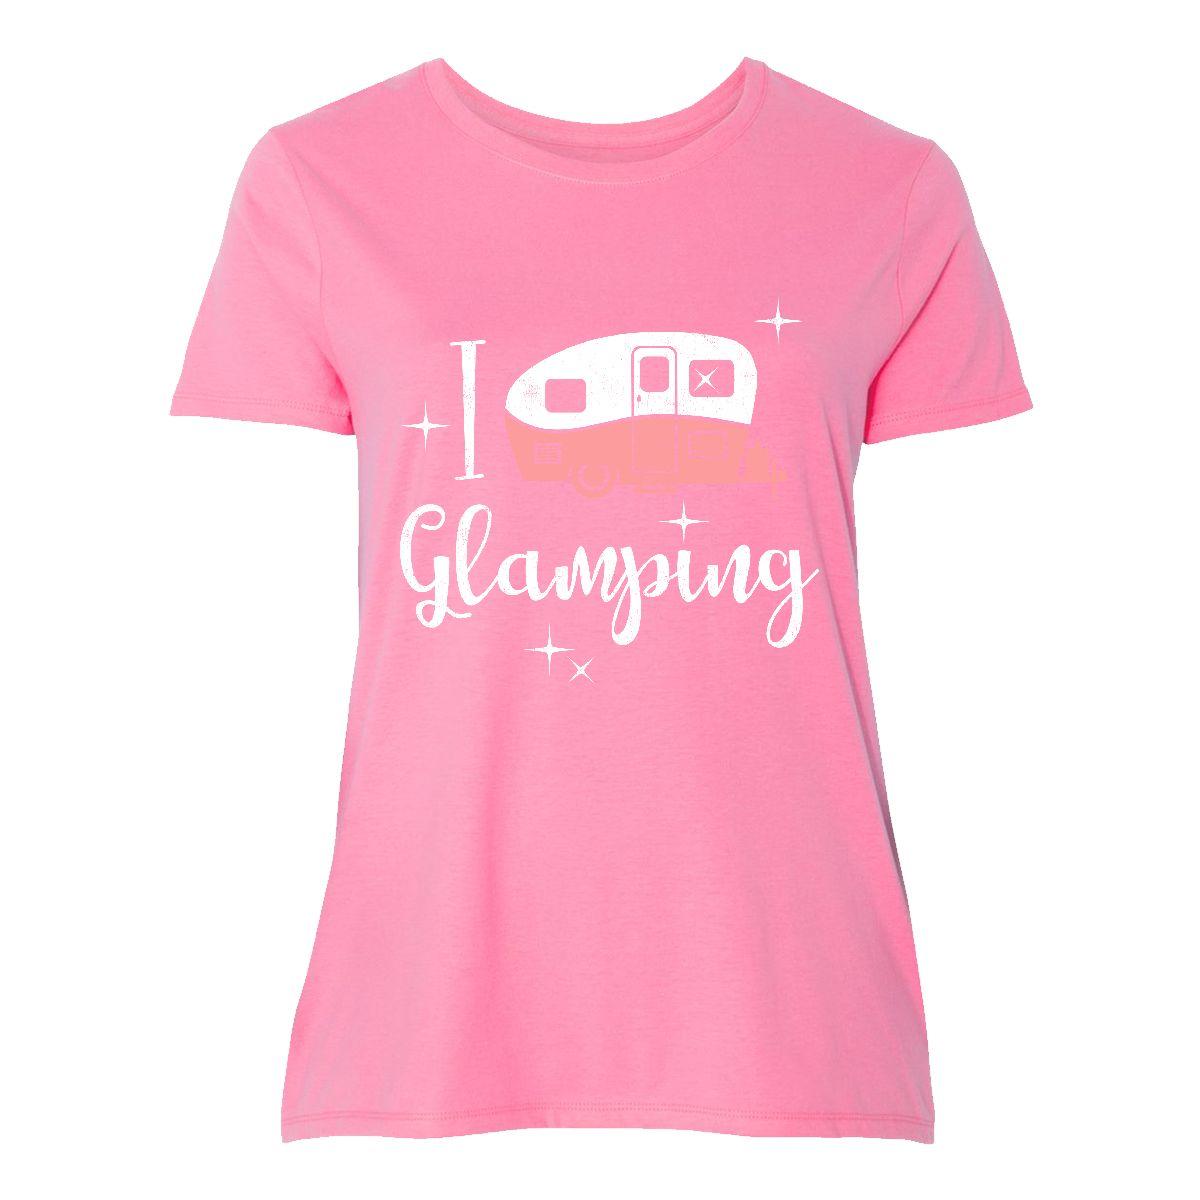 dd6f0dbb Inktastic I Love Glamping Women's Plus Size T-Shirt Happy Glamper ...